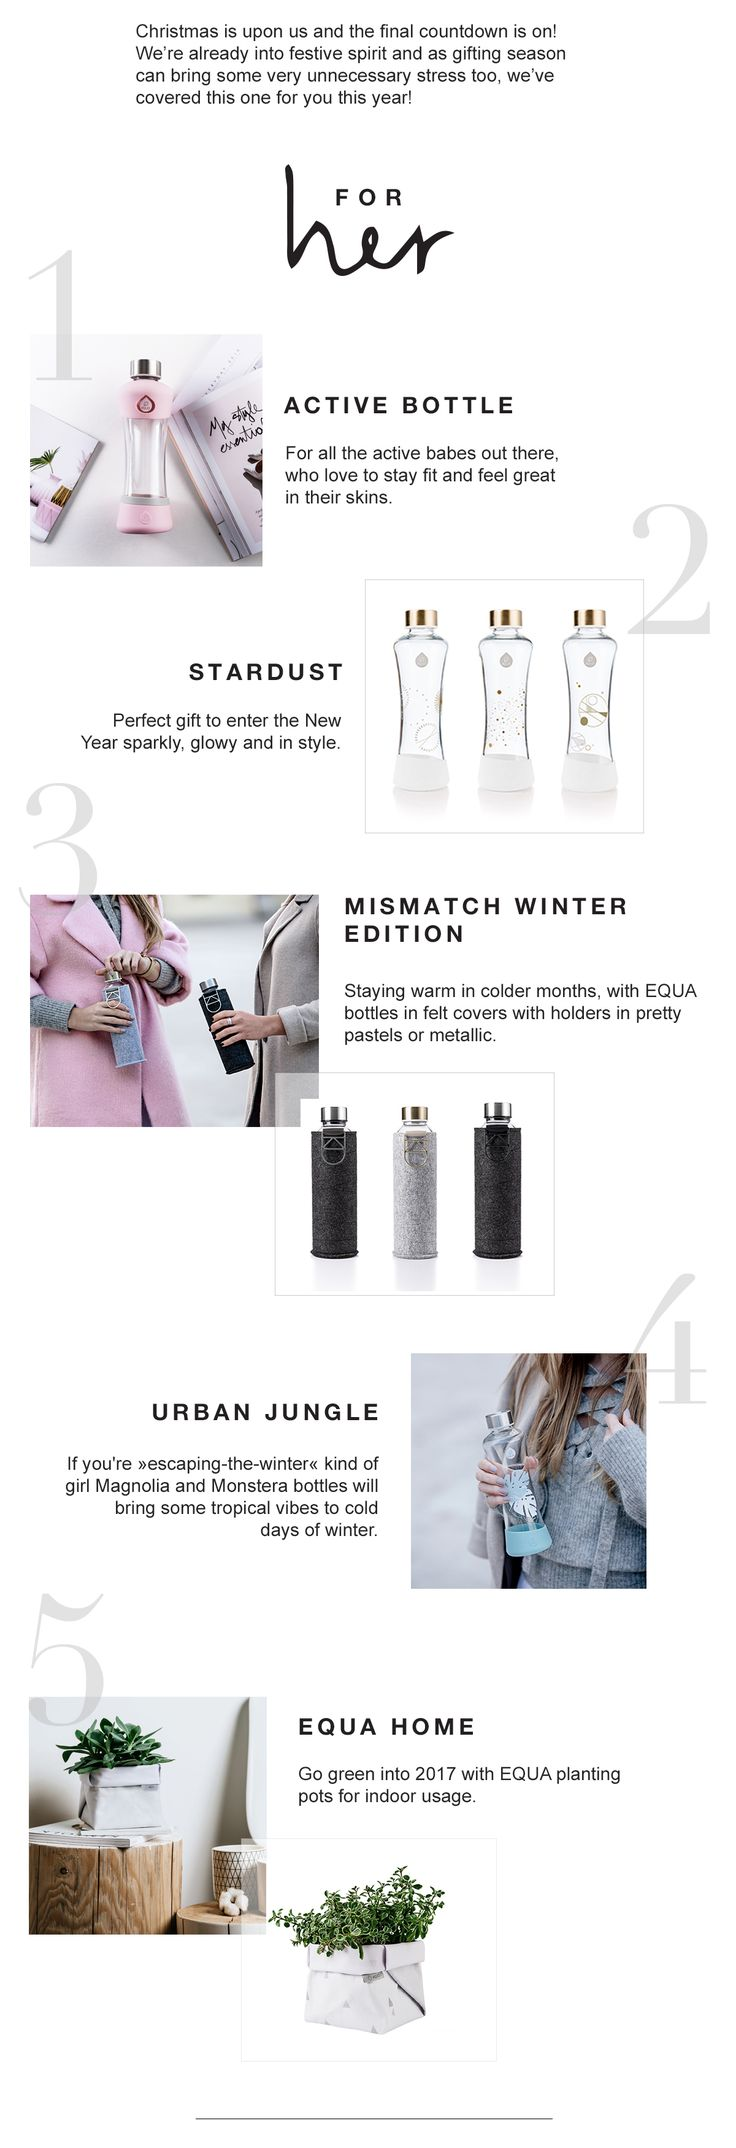 Christmas gift ideas for HER & HIM | EQUA